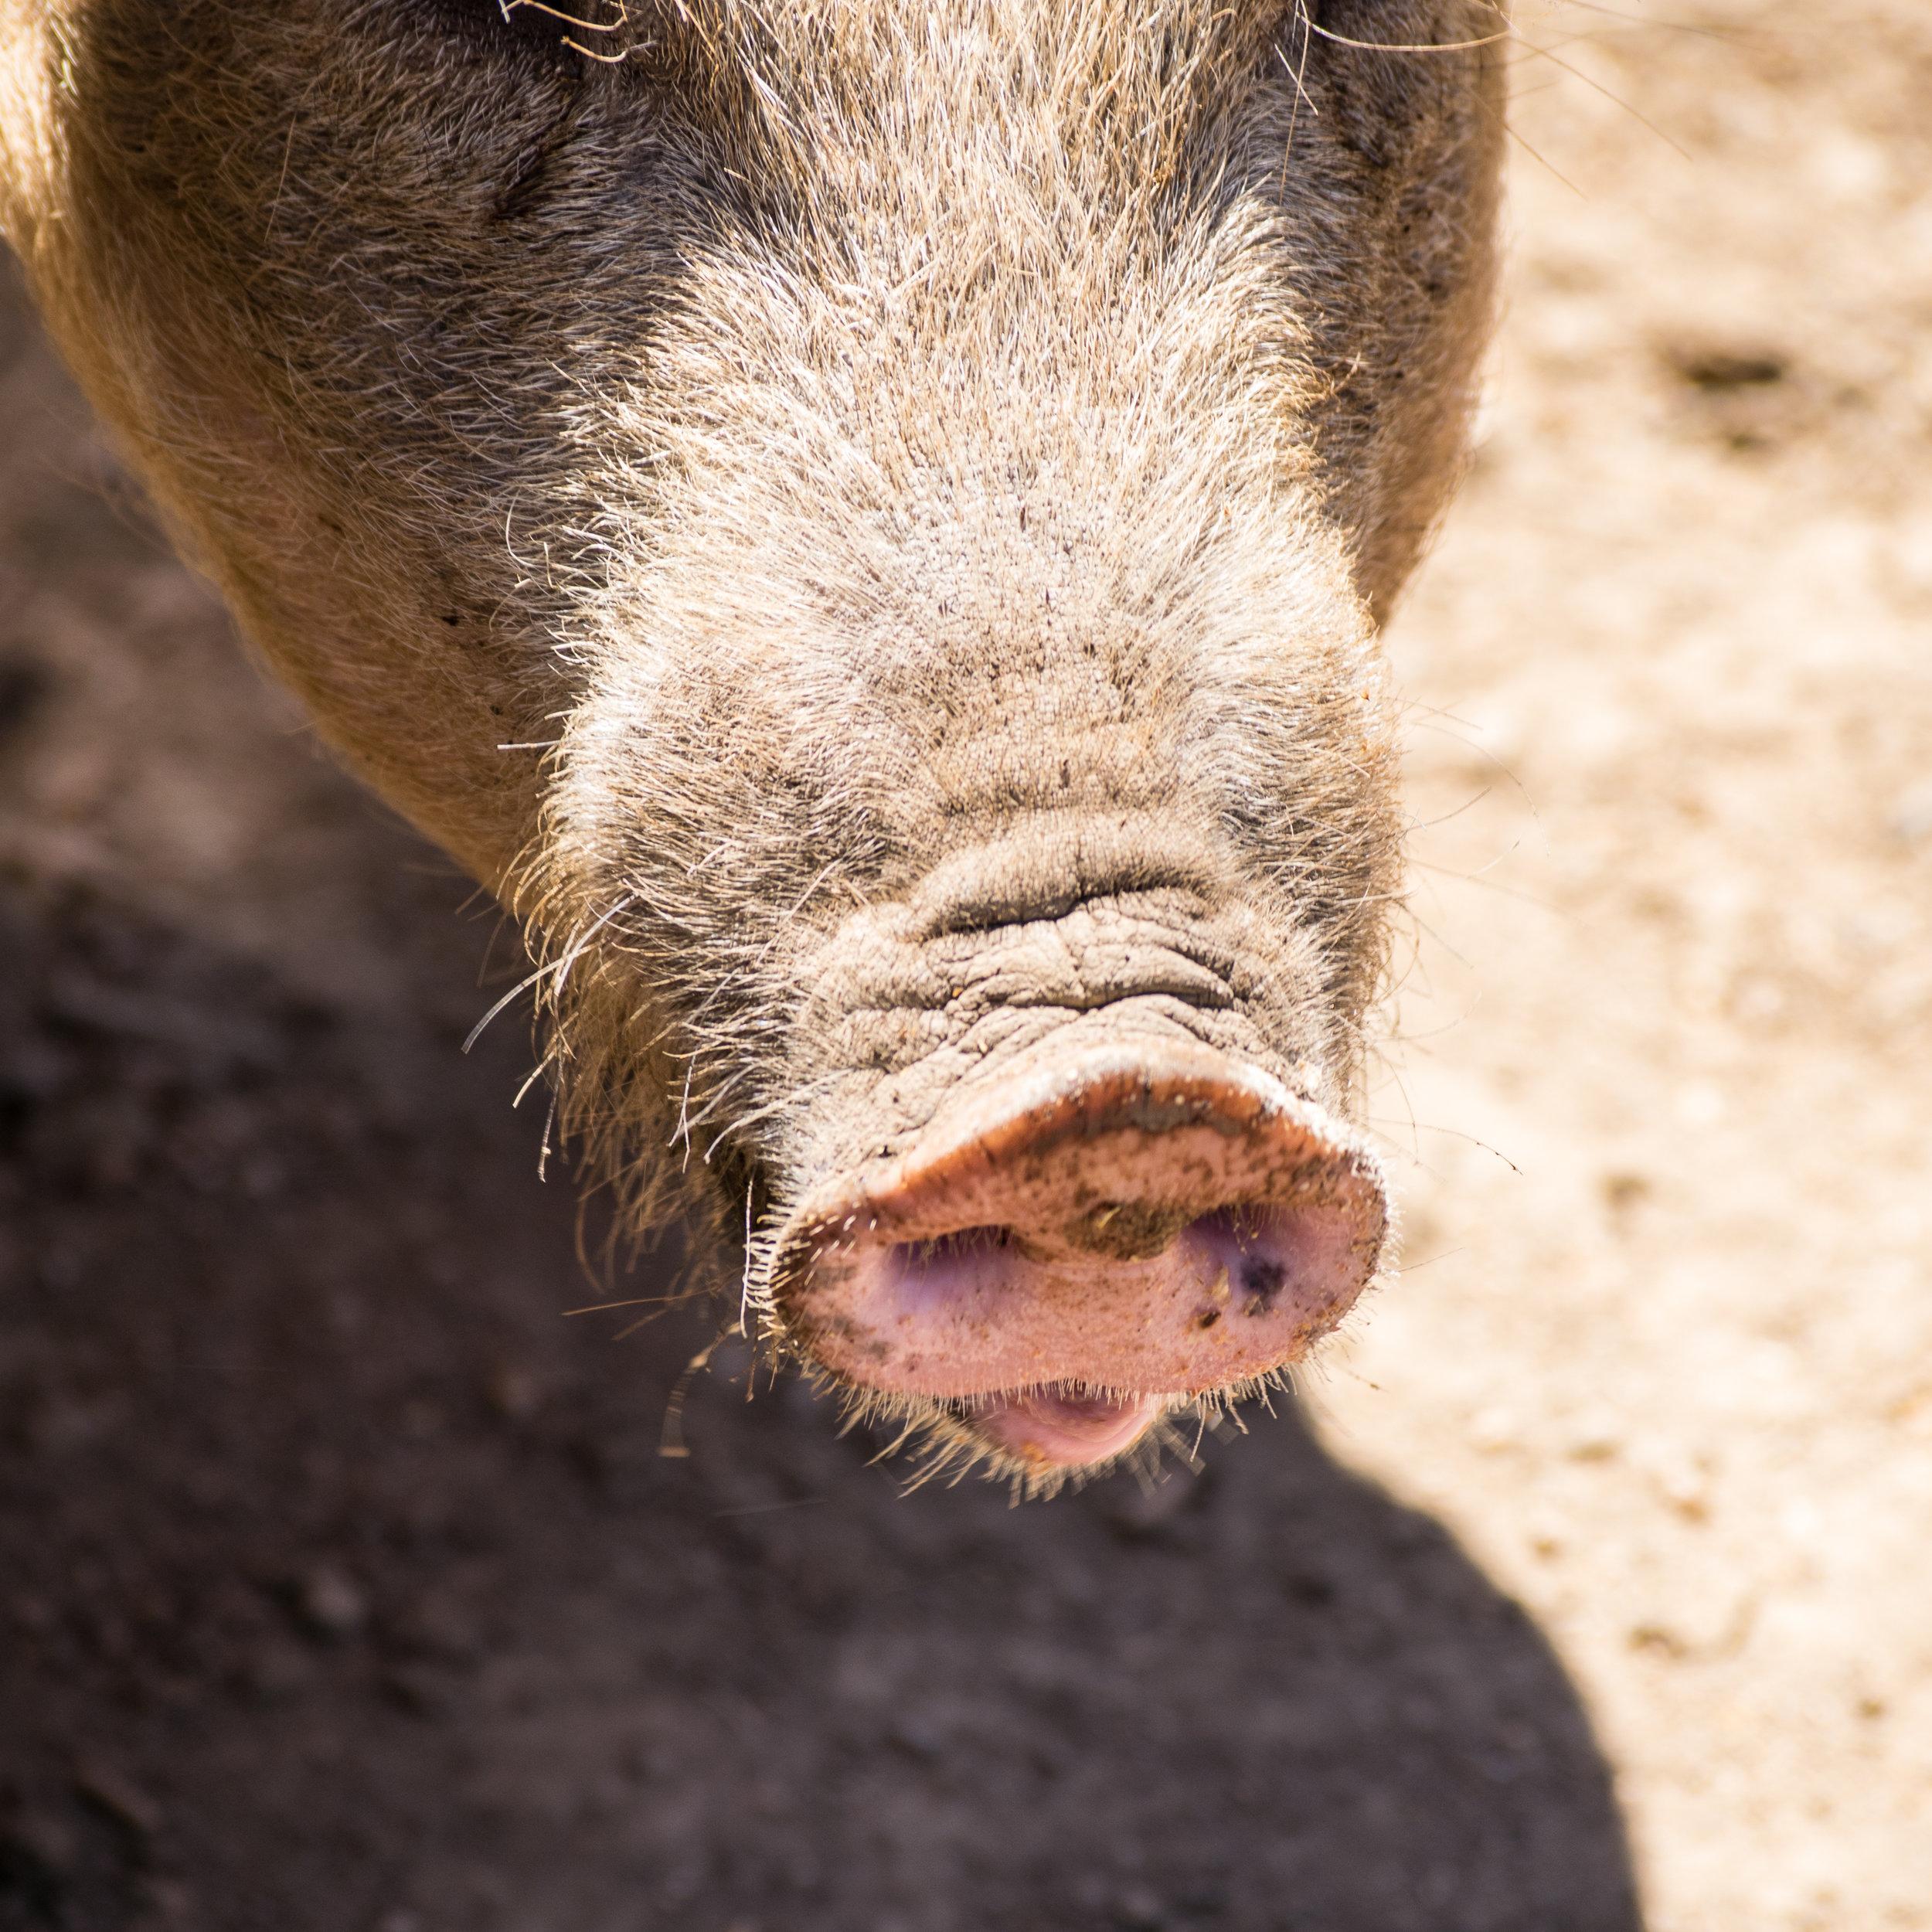 Bare Bones Butcher | Pasture Raised Pork